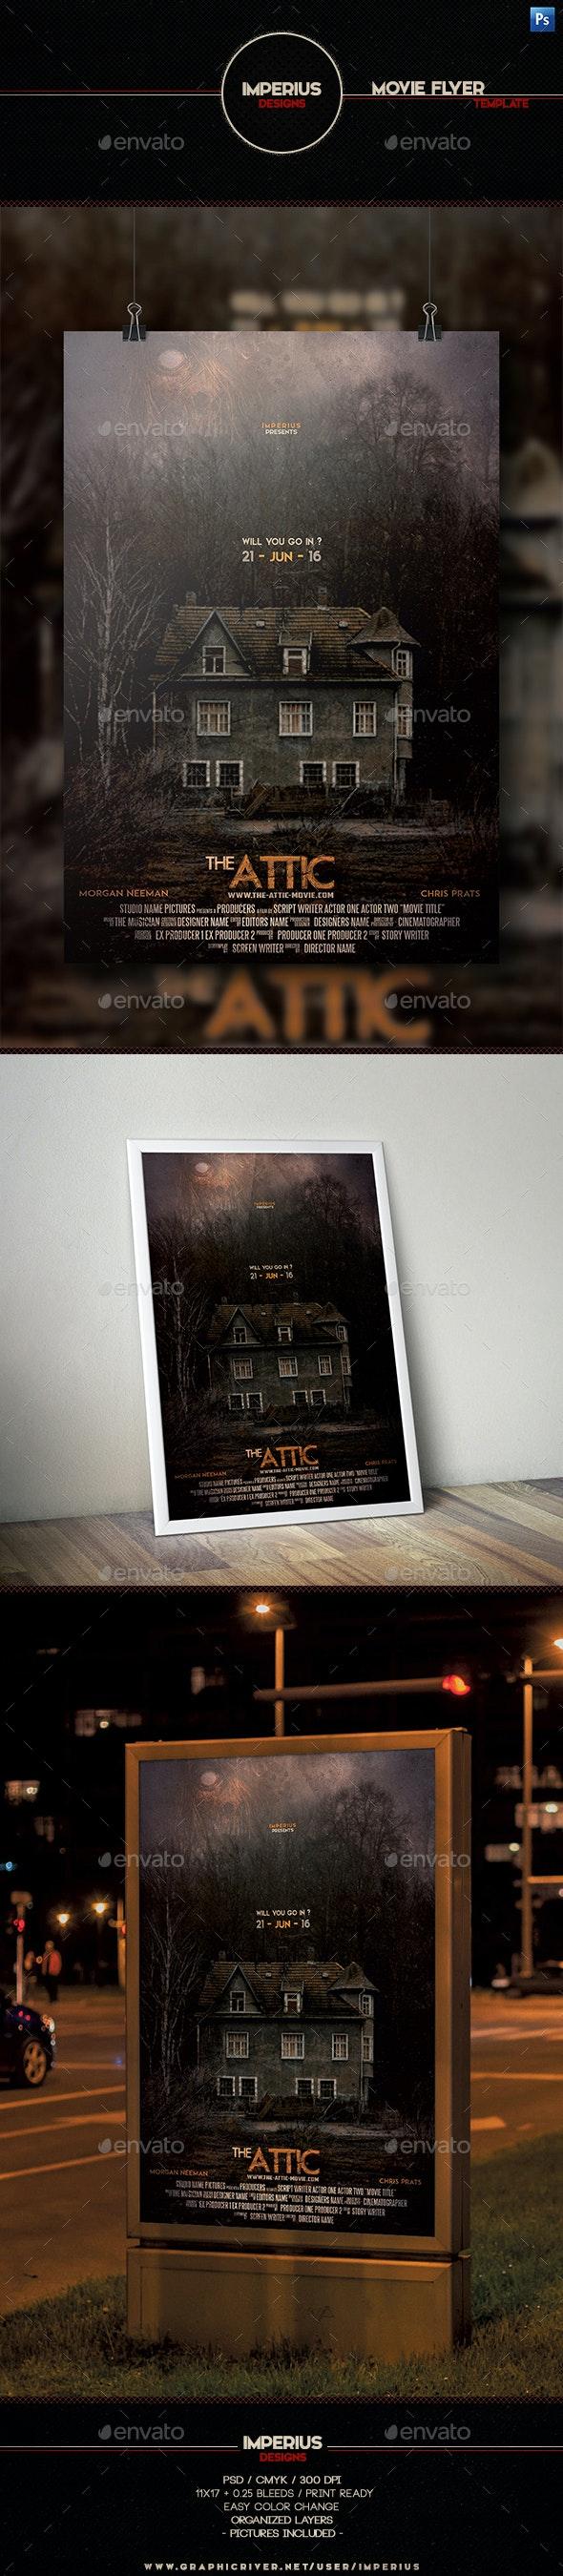 The Attic Movie Flyer